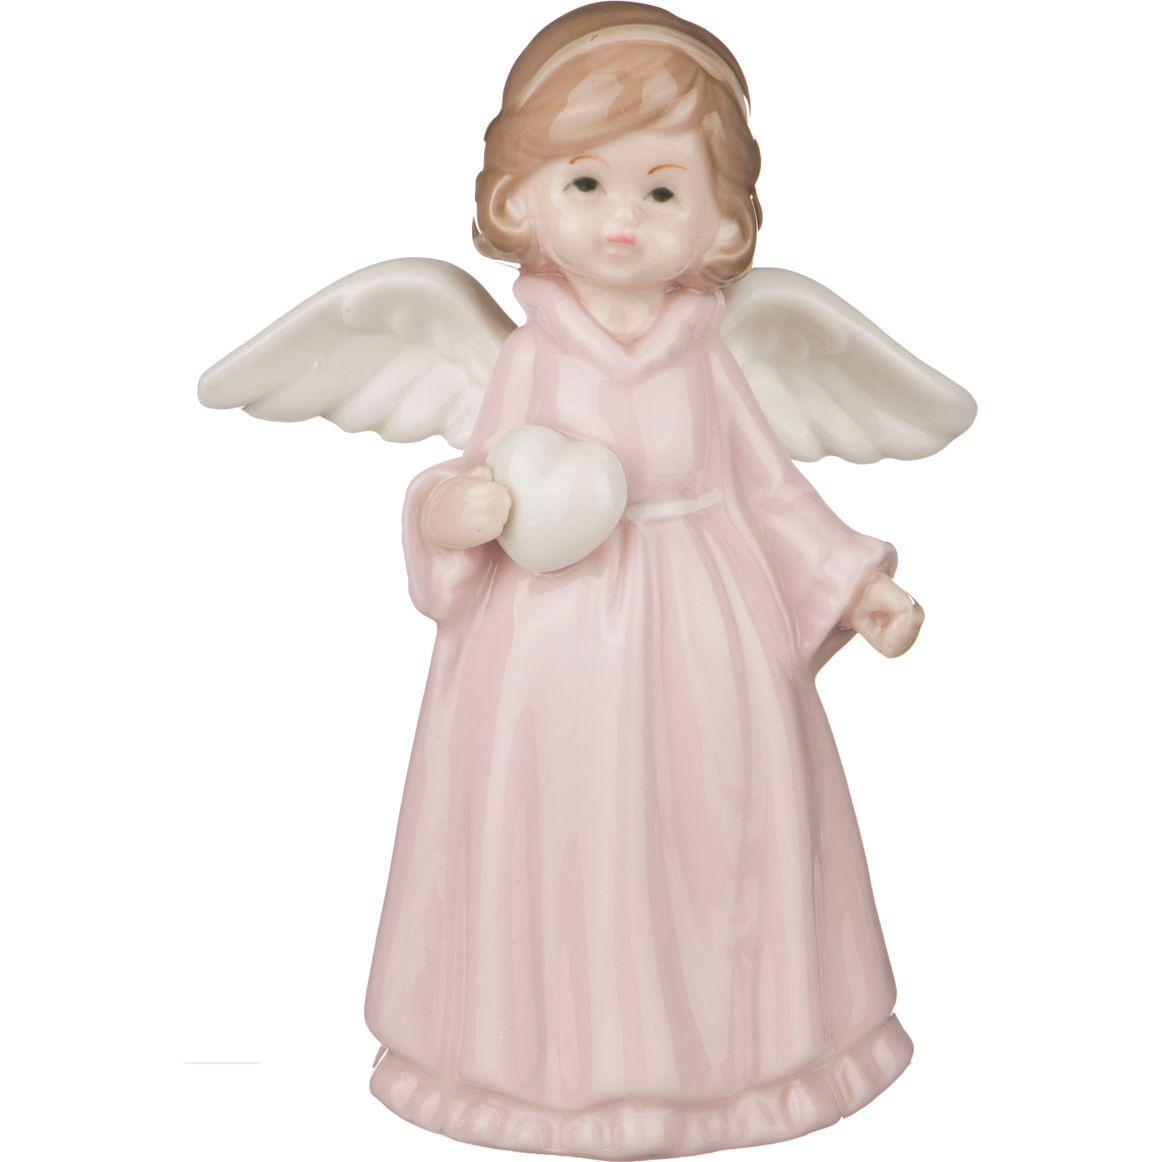 Фигурка Lefard Девочка-Ангелочек LF-146/393, розовый, белый, 9 х 6 х 13 см цена